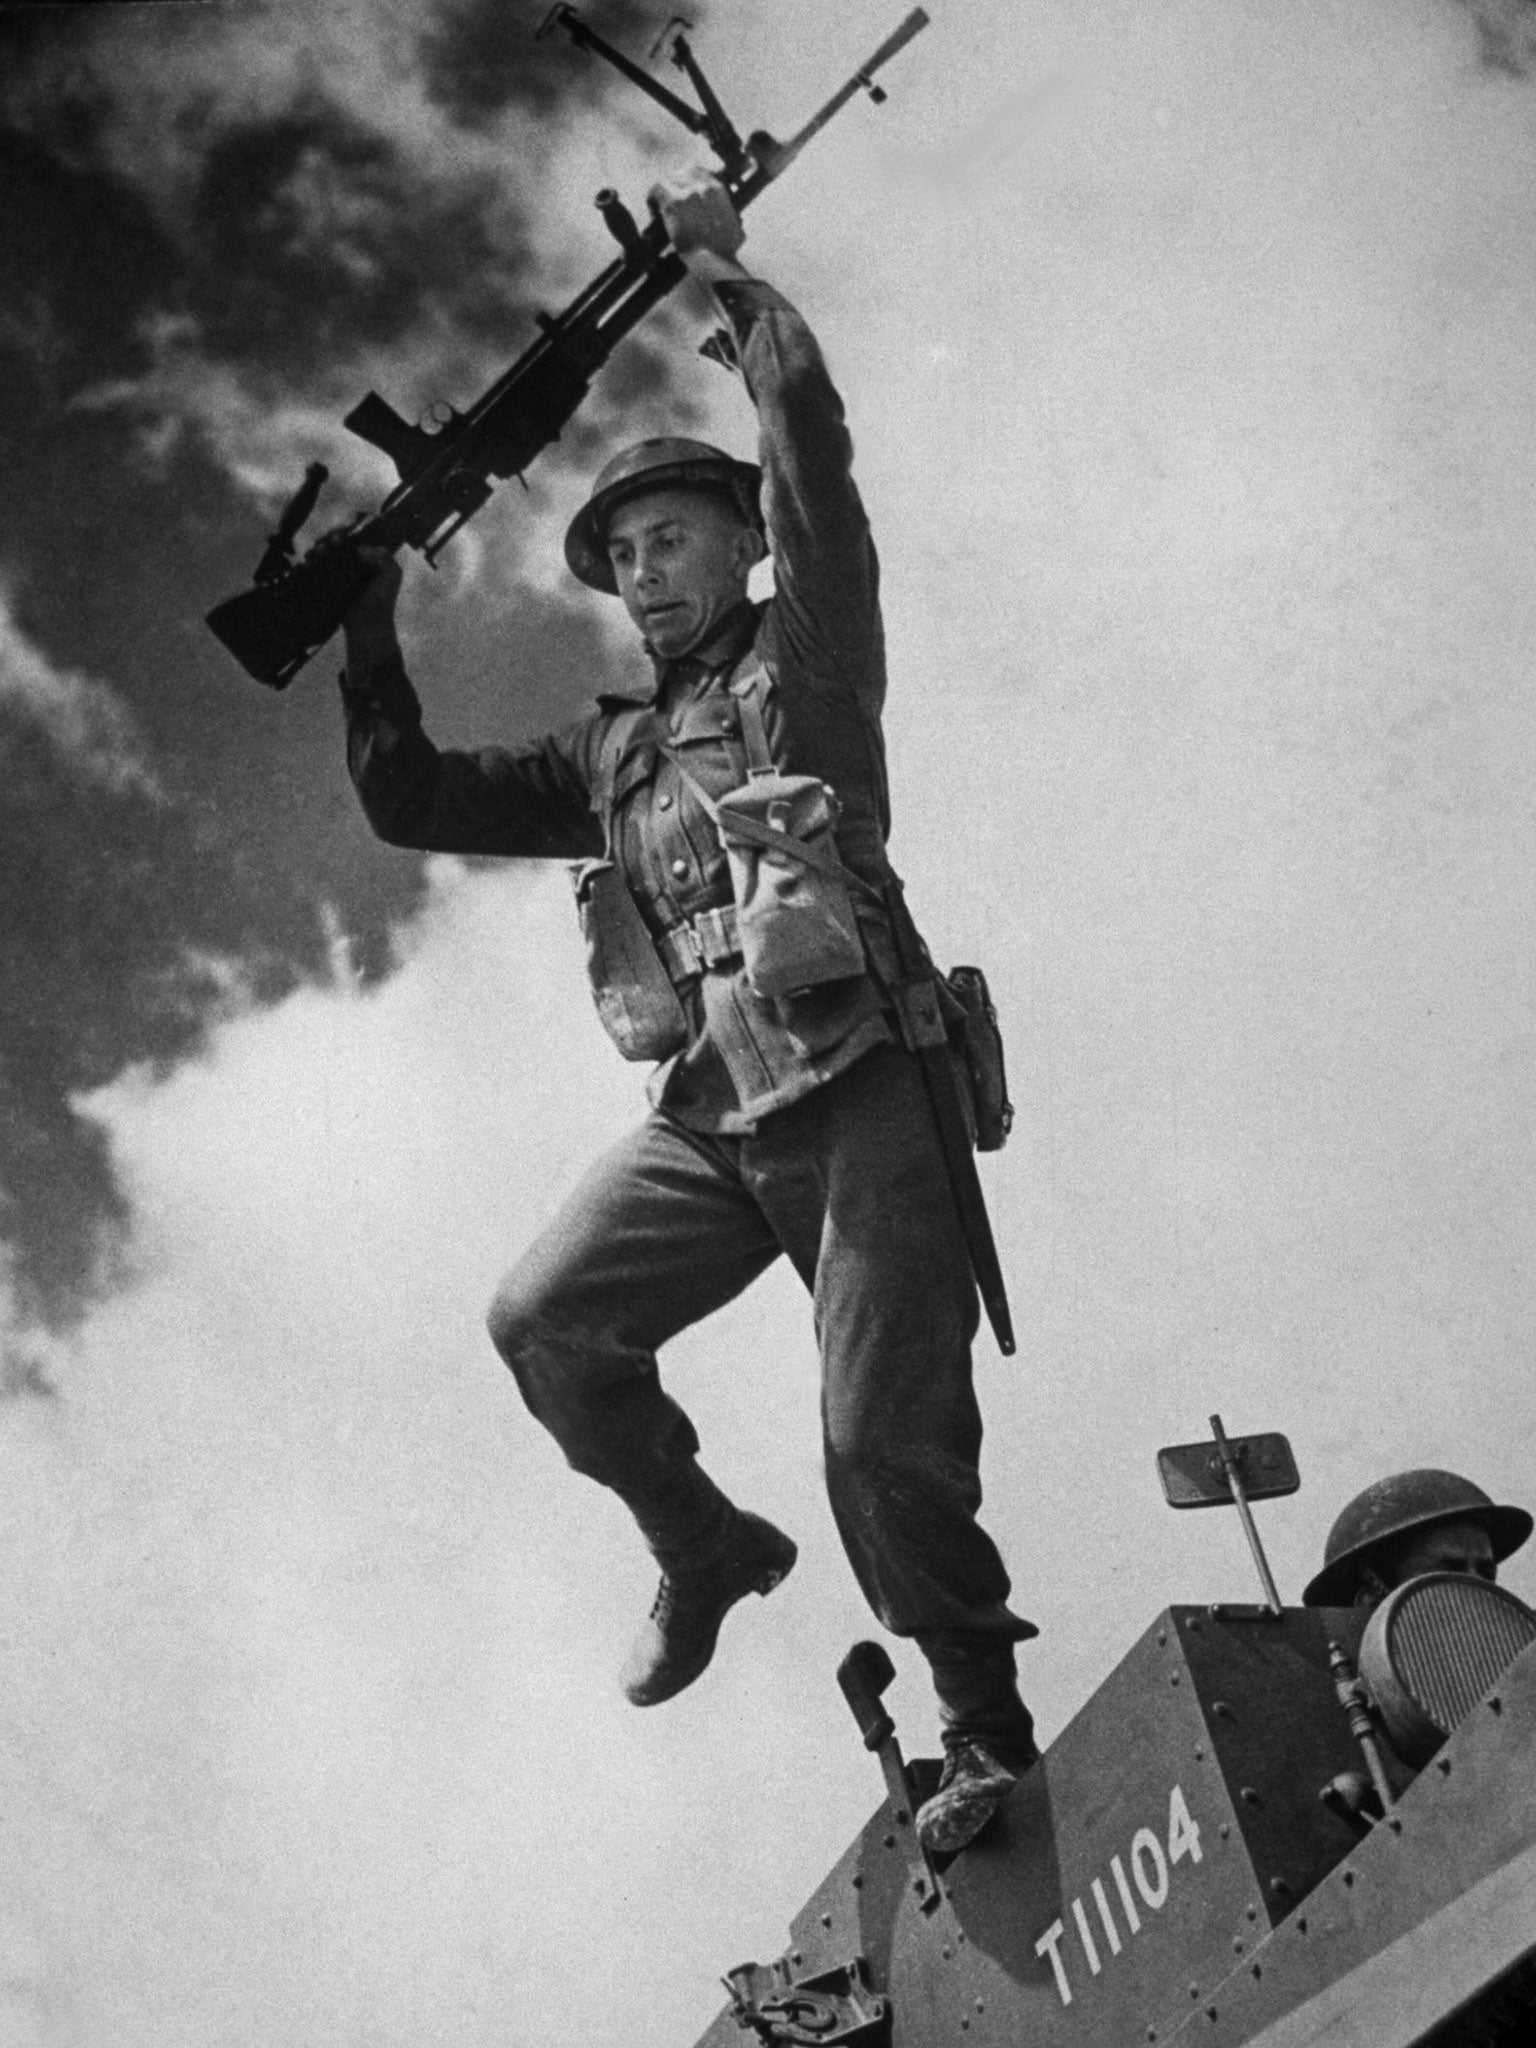 Wojtek: The bear who fought Hitler's Nazis | The Independent